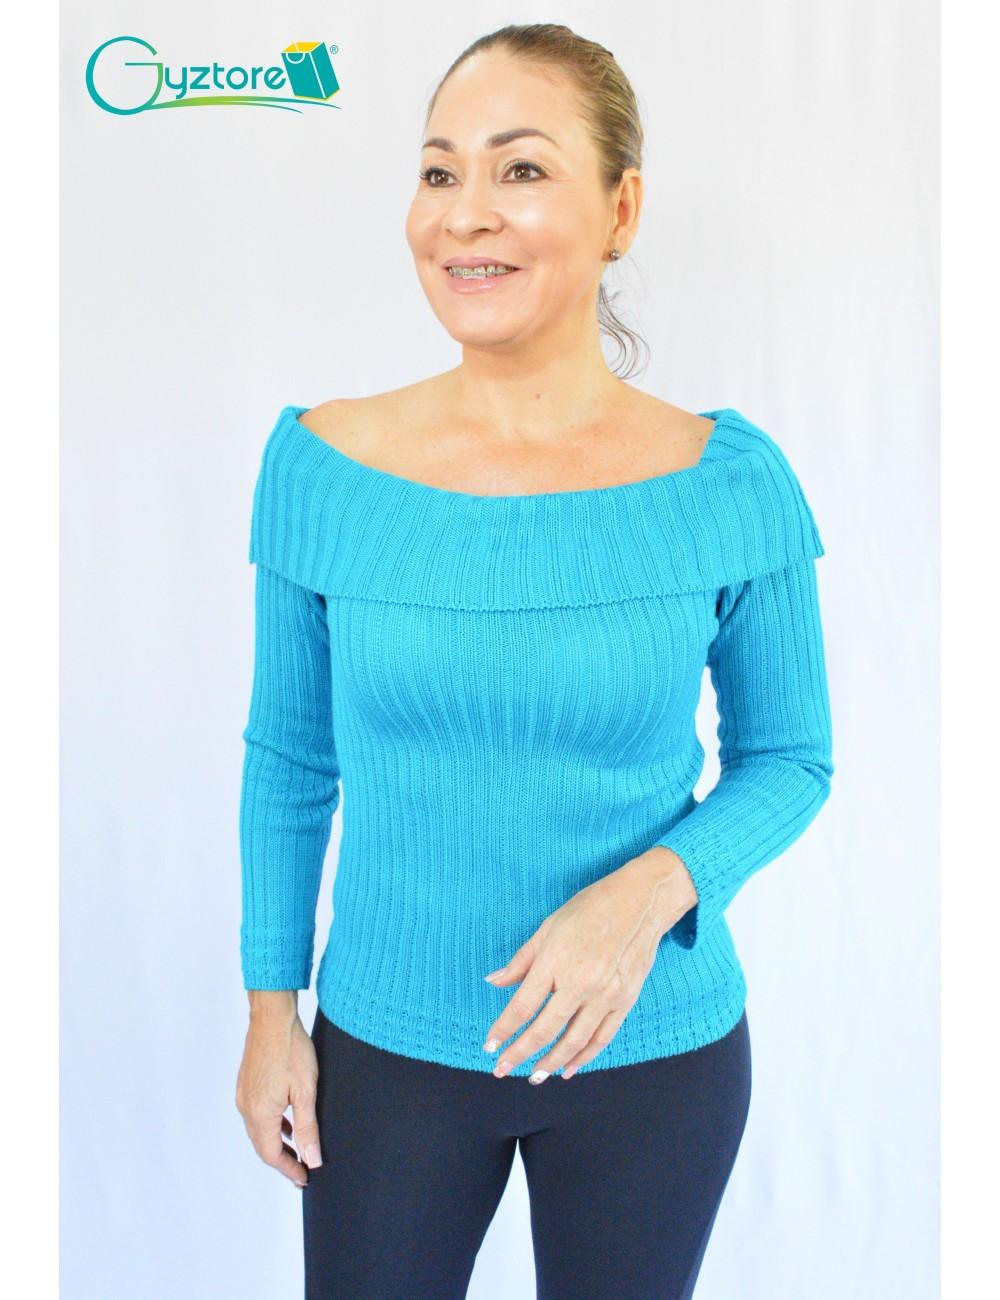 Blusa artesanal tejida a mano hombros descubiertos